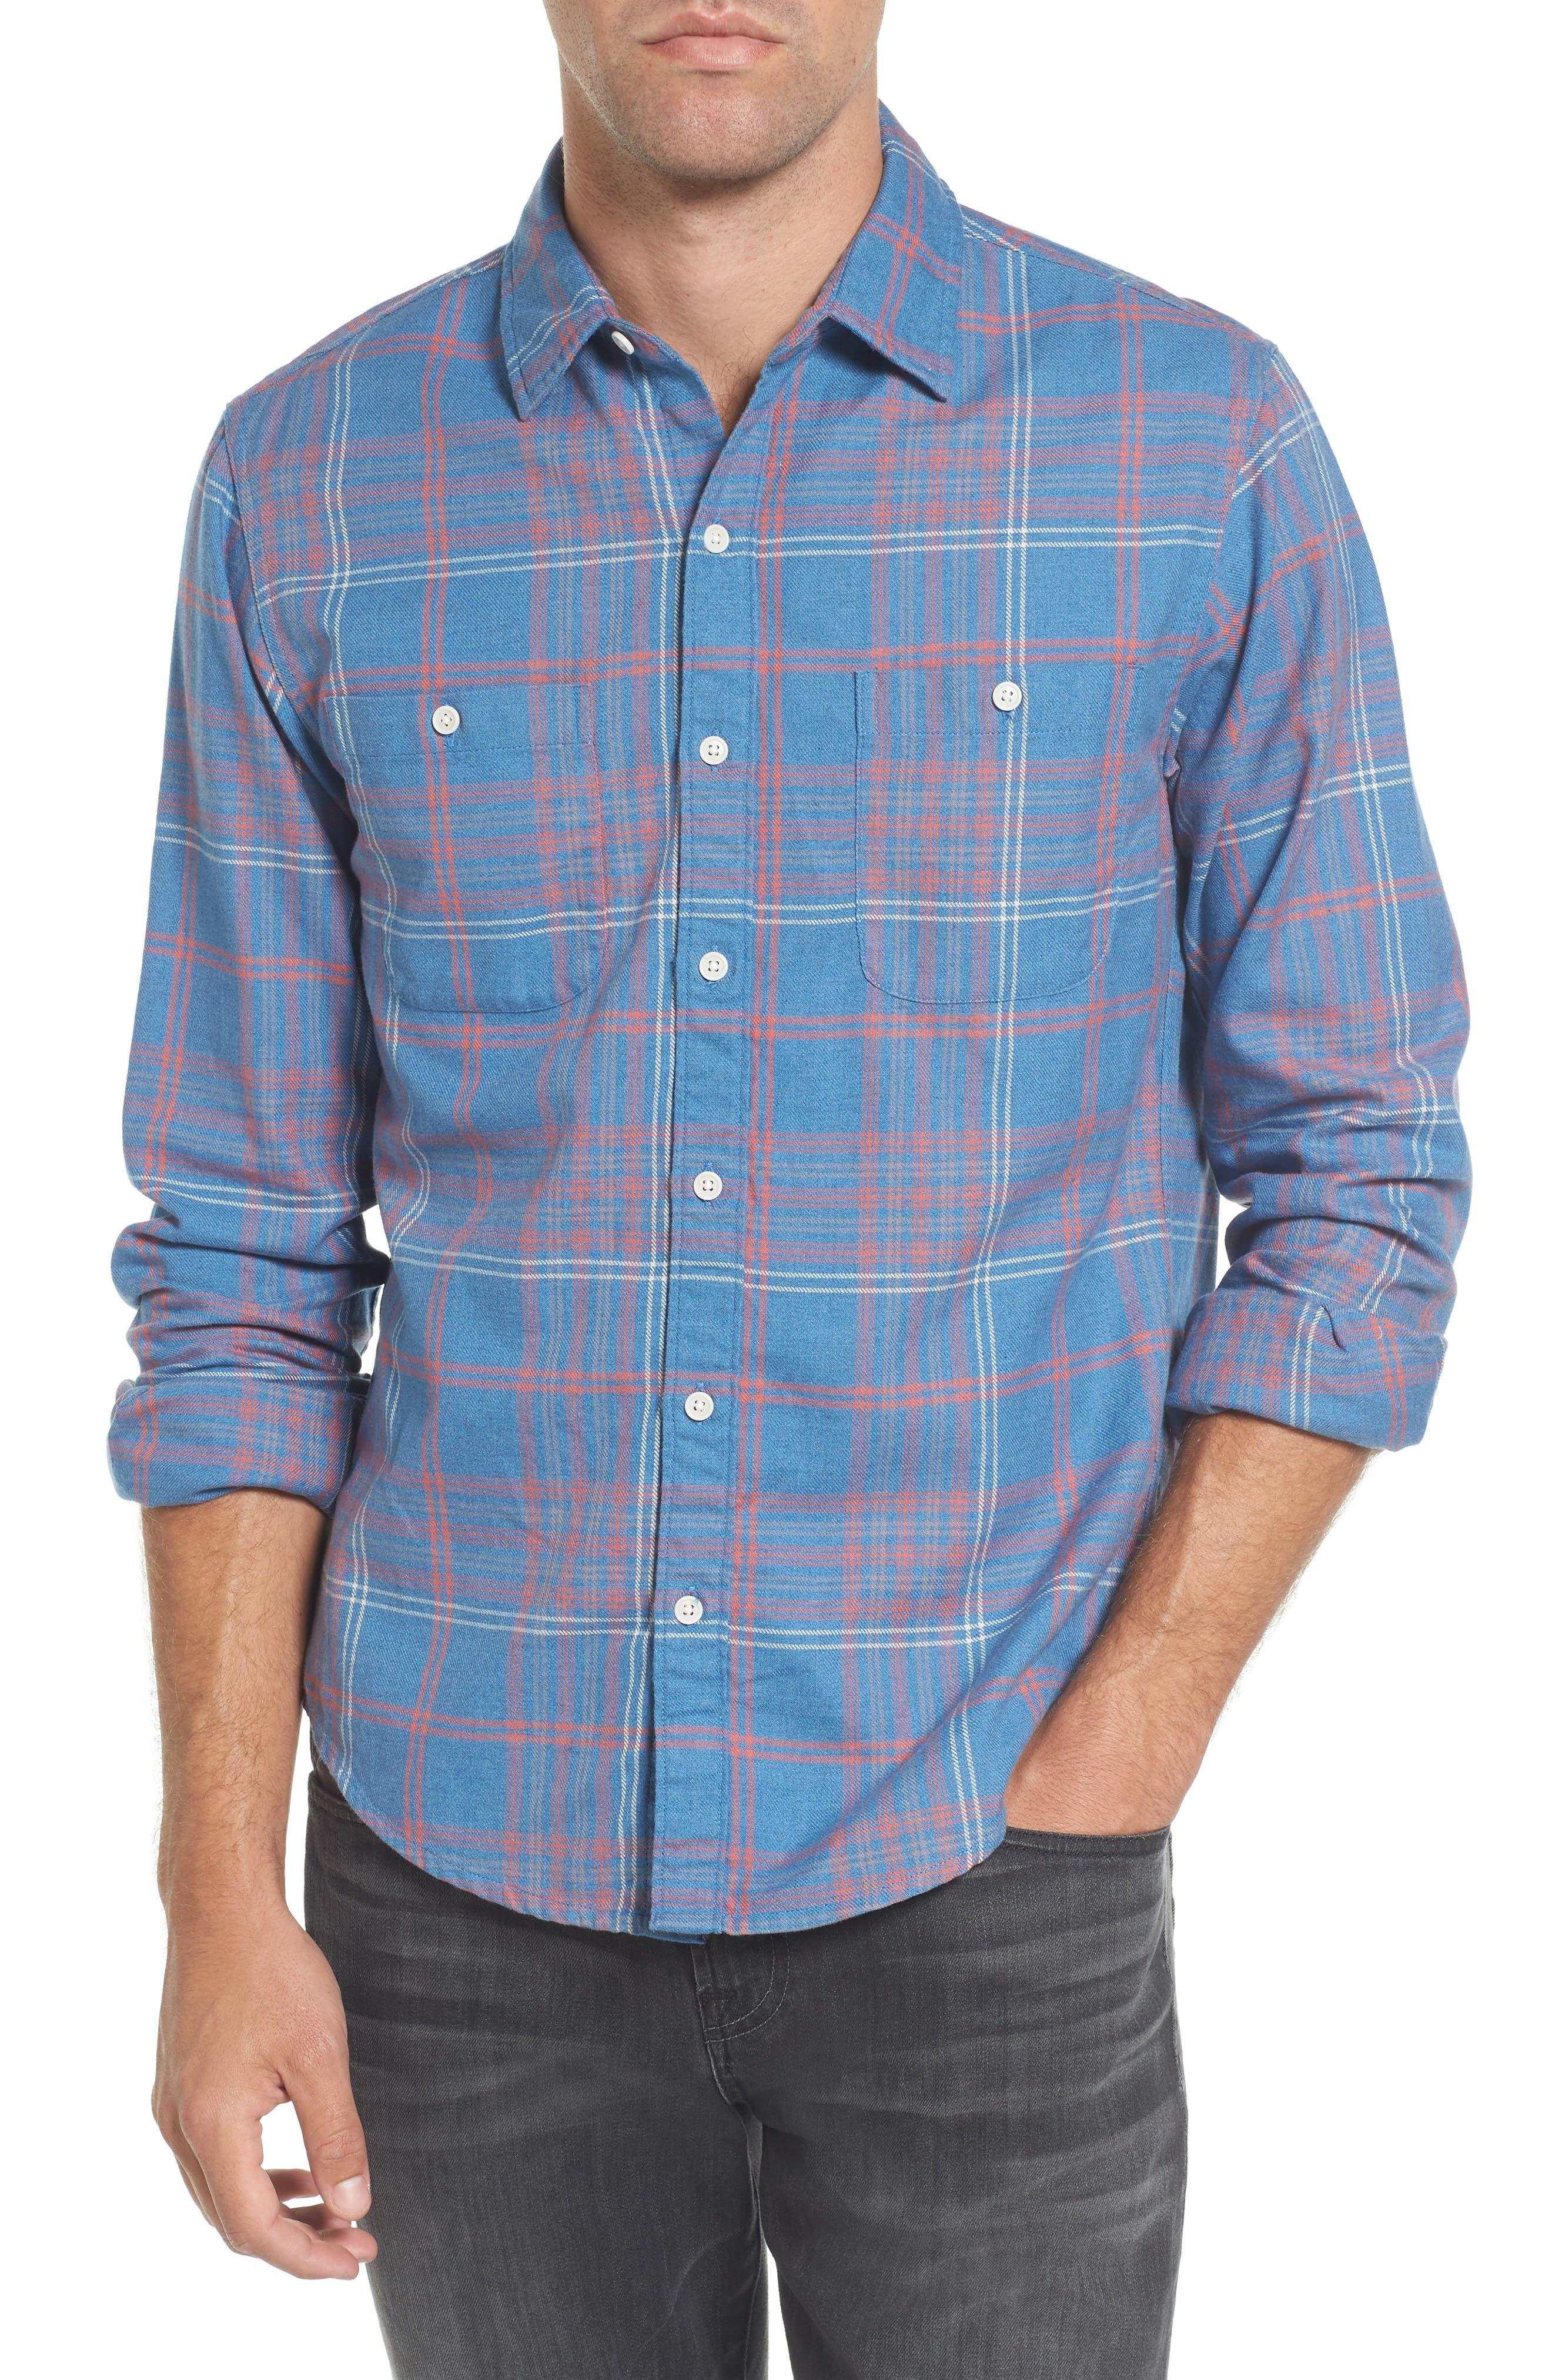 Alternate Image 1 Selected - Bonobos Slim Fit Plaid Flannel Sport Shirt